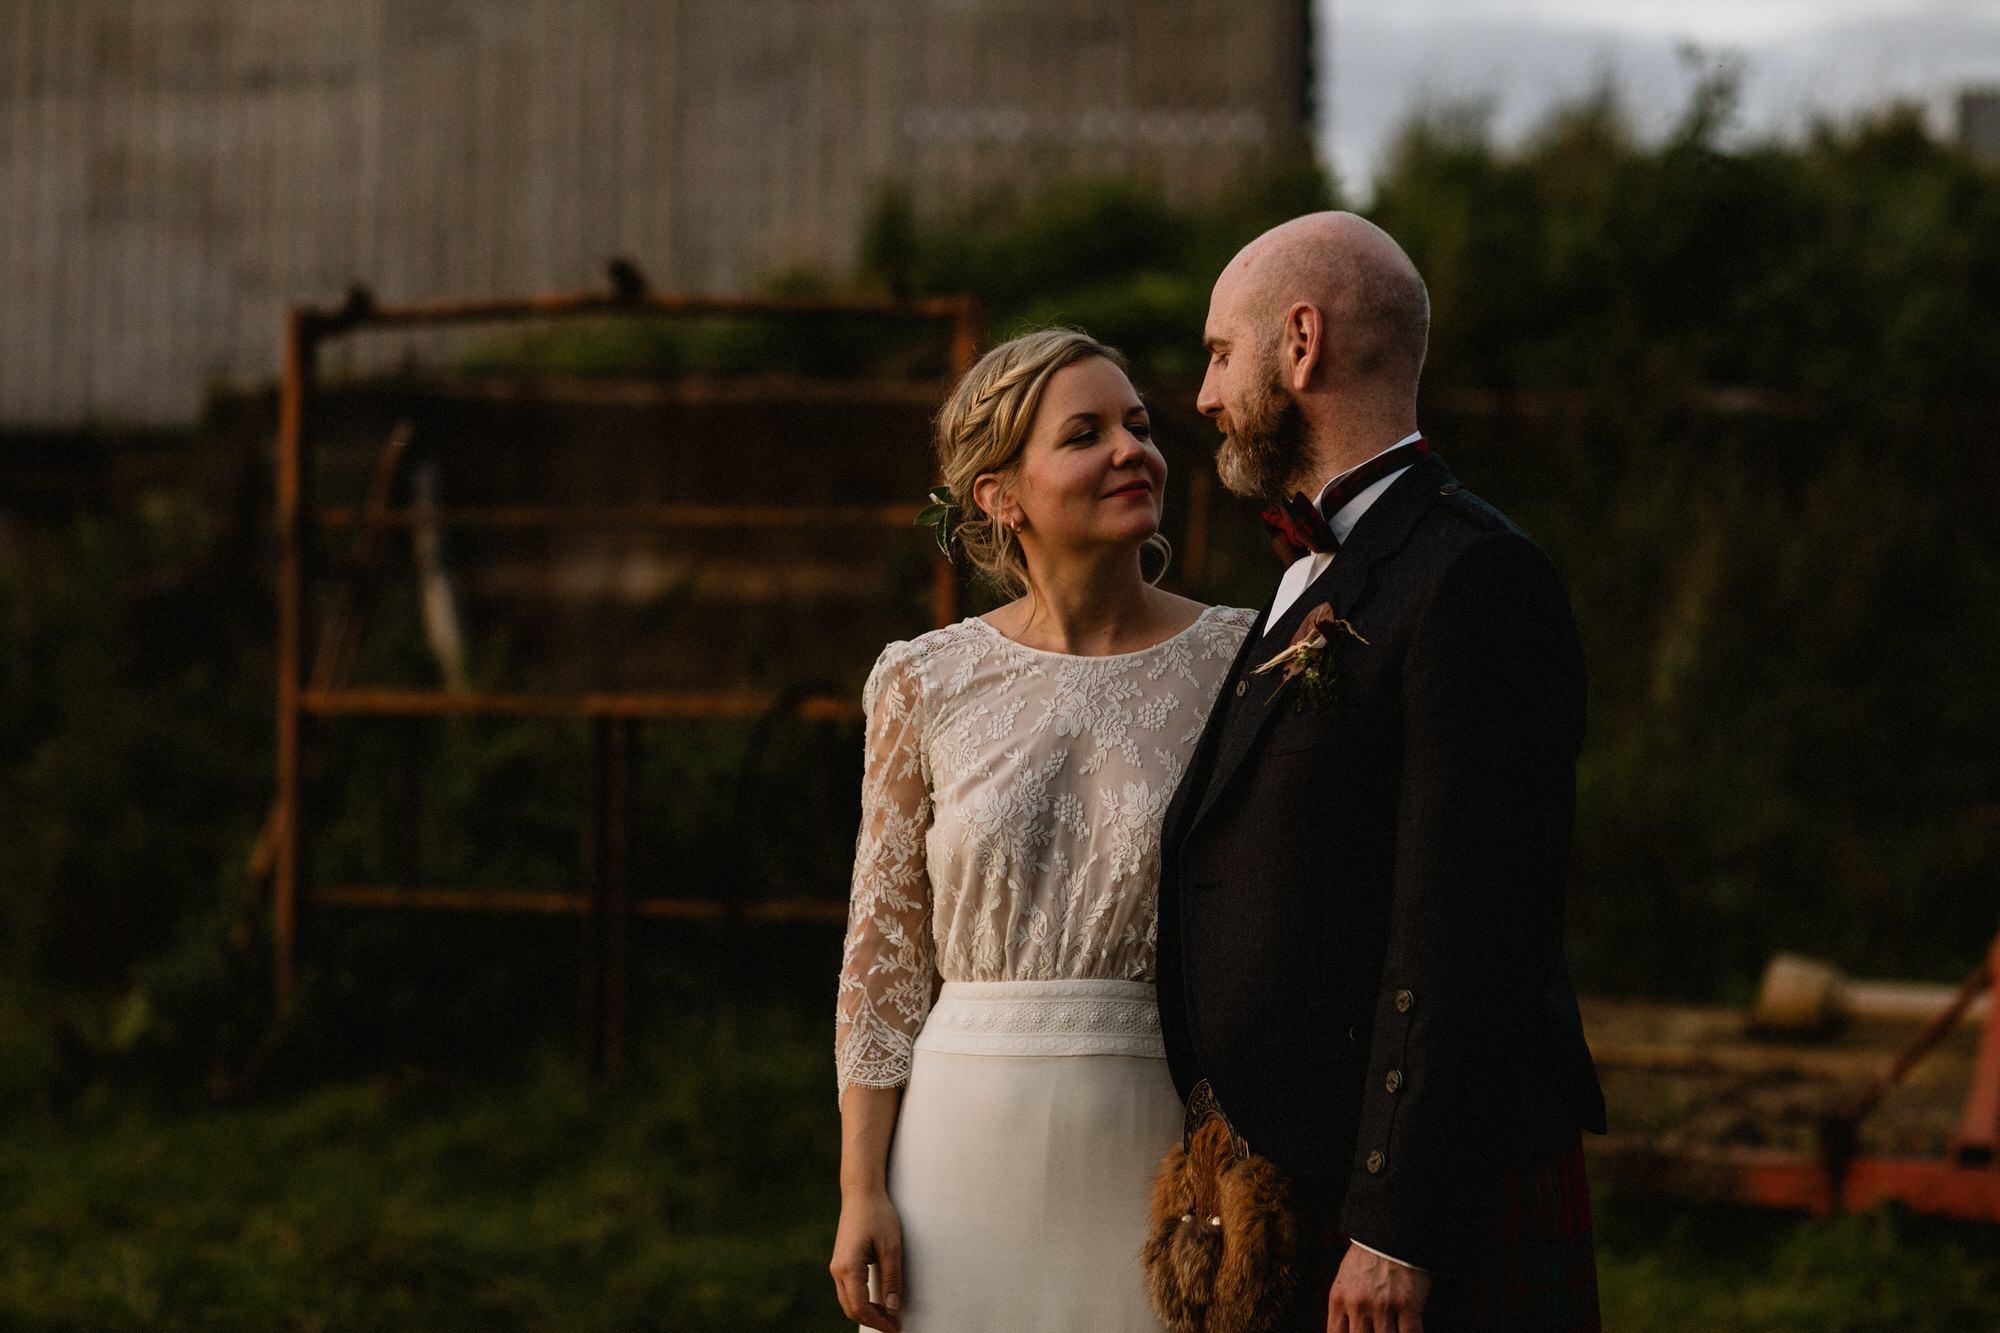 068 SUNSET GOLDEN HOUR TIN SHED KNOCKRAICH WEDDING AUTUMN ZOE ALEXANDRA PHOTOGRAPHY